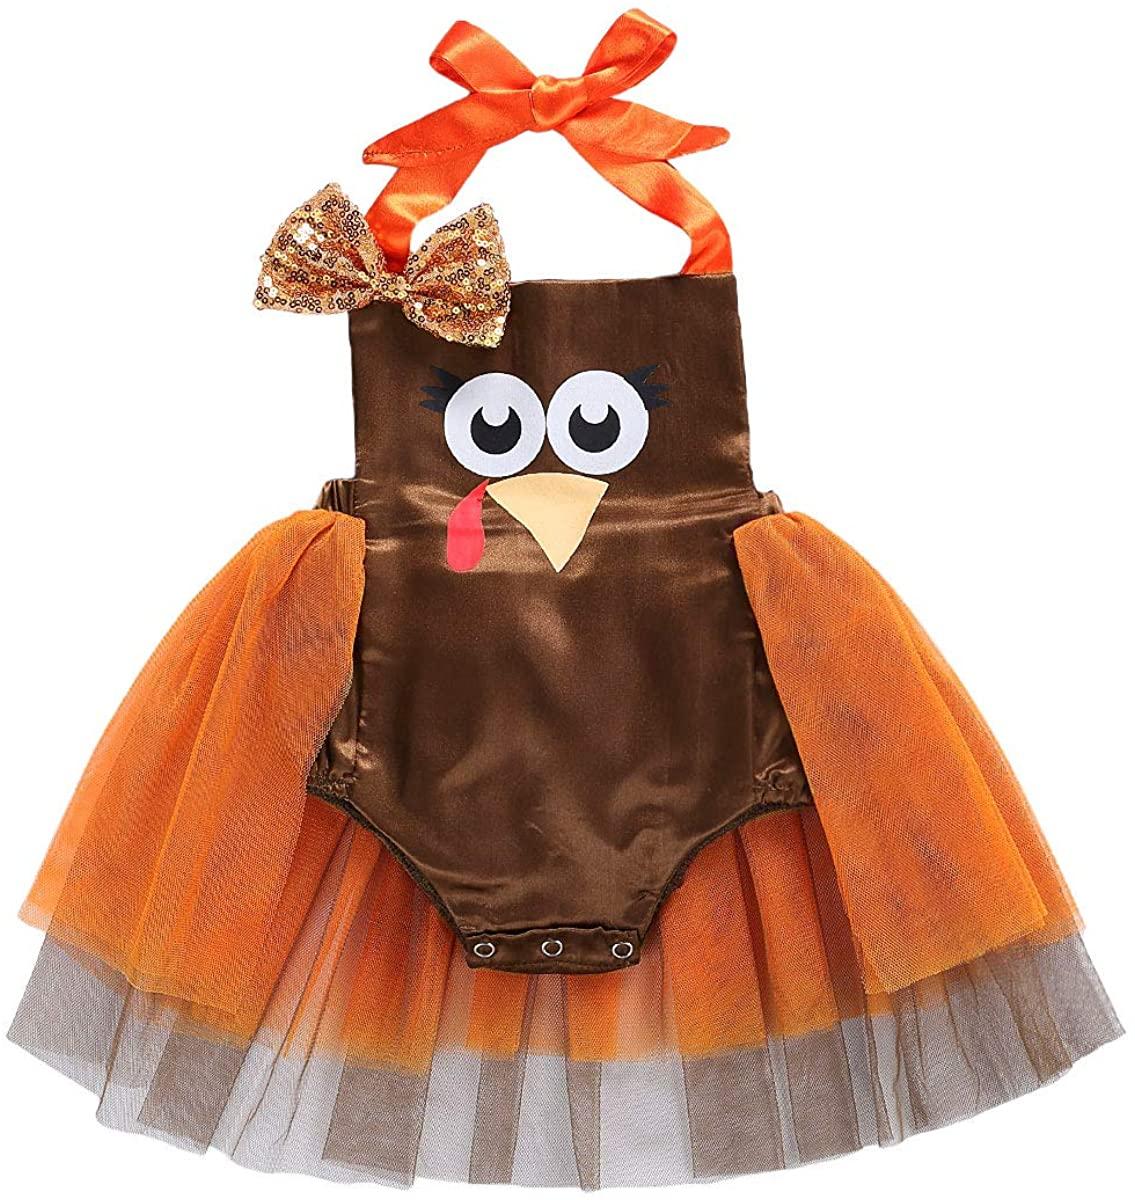 Newborn Baby Girl Thanksgiving Romper Turkey Sleeveless Halter Onesies Tutu Dress Jumpsuit Clothes